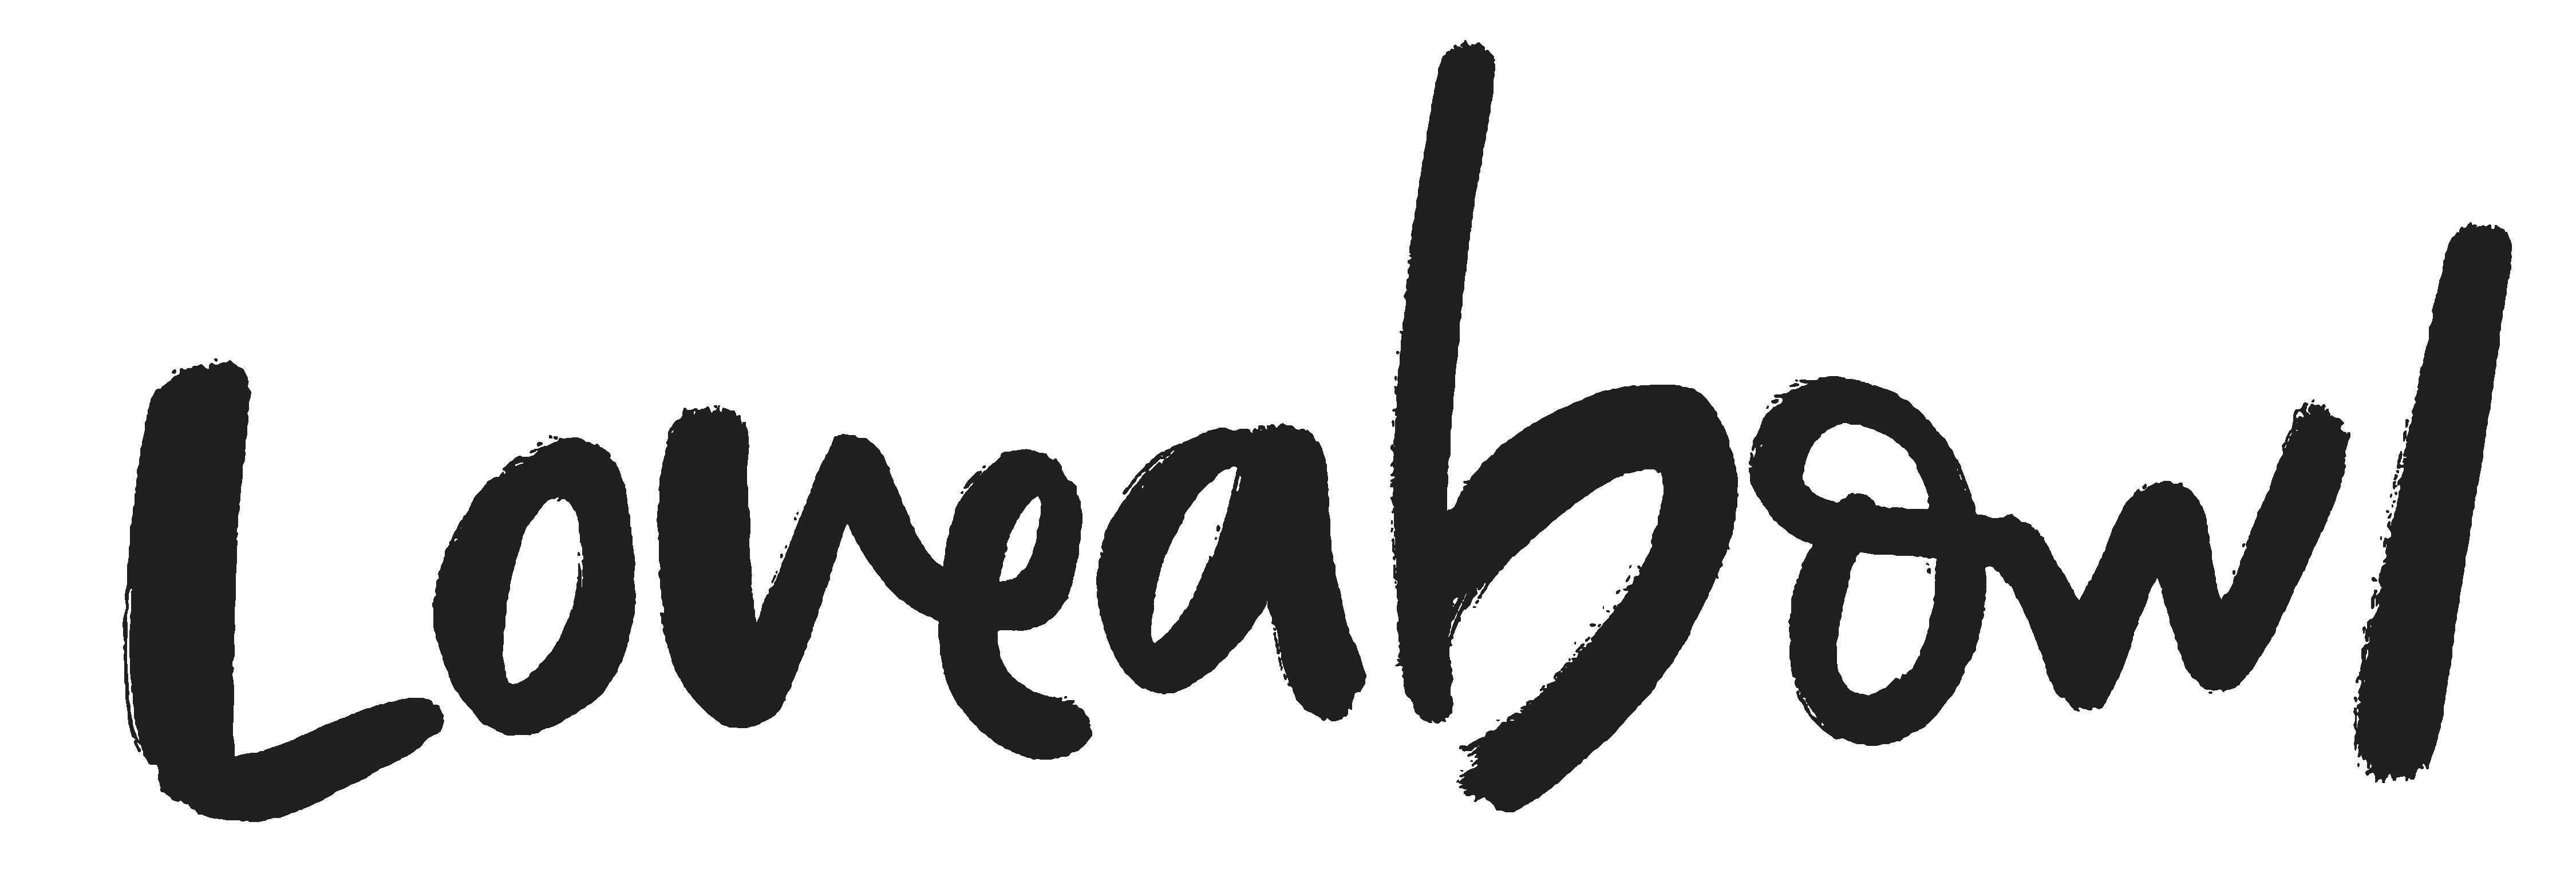 Loveabowl Brand Logo.png